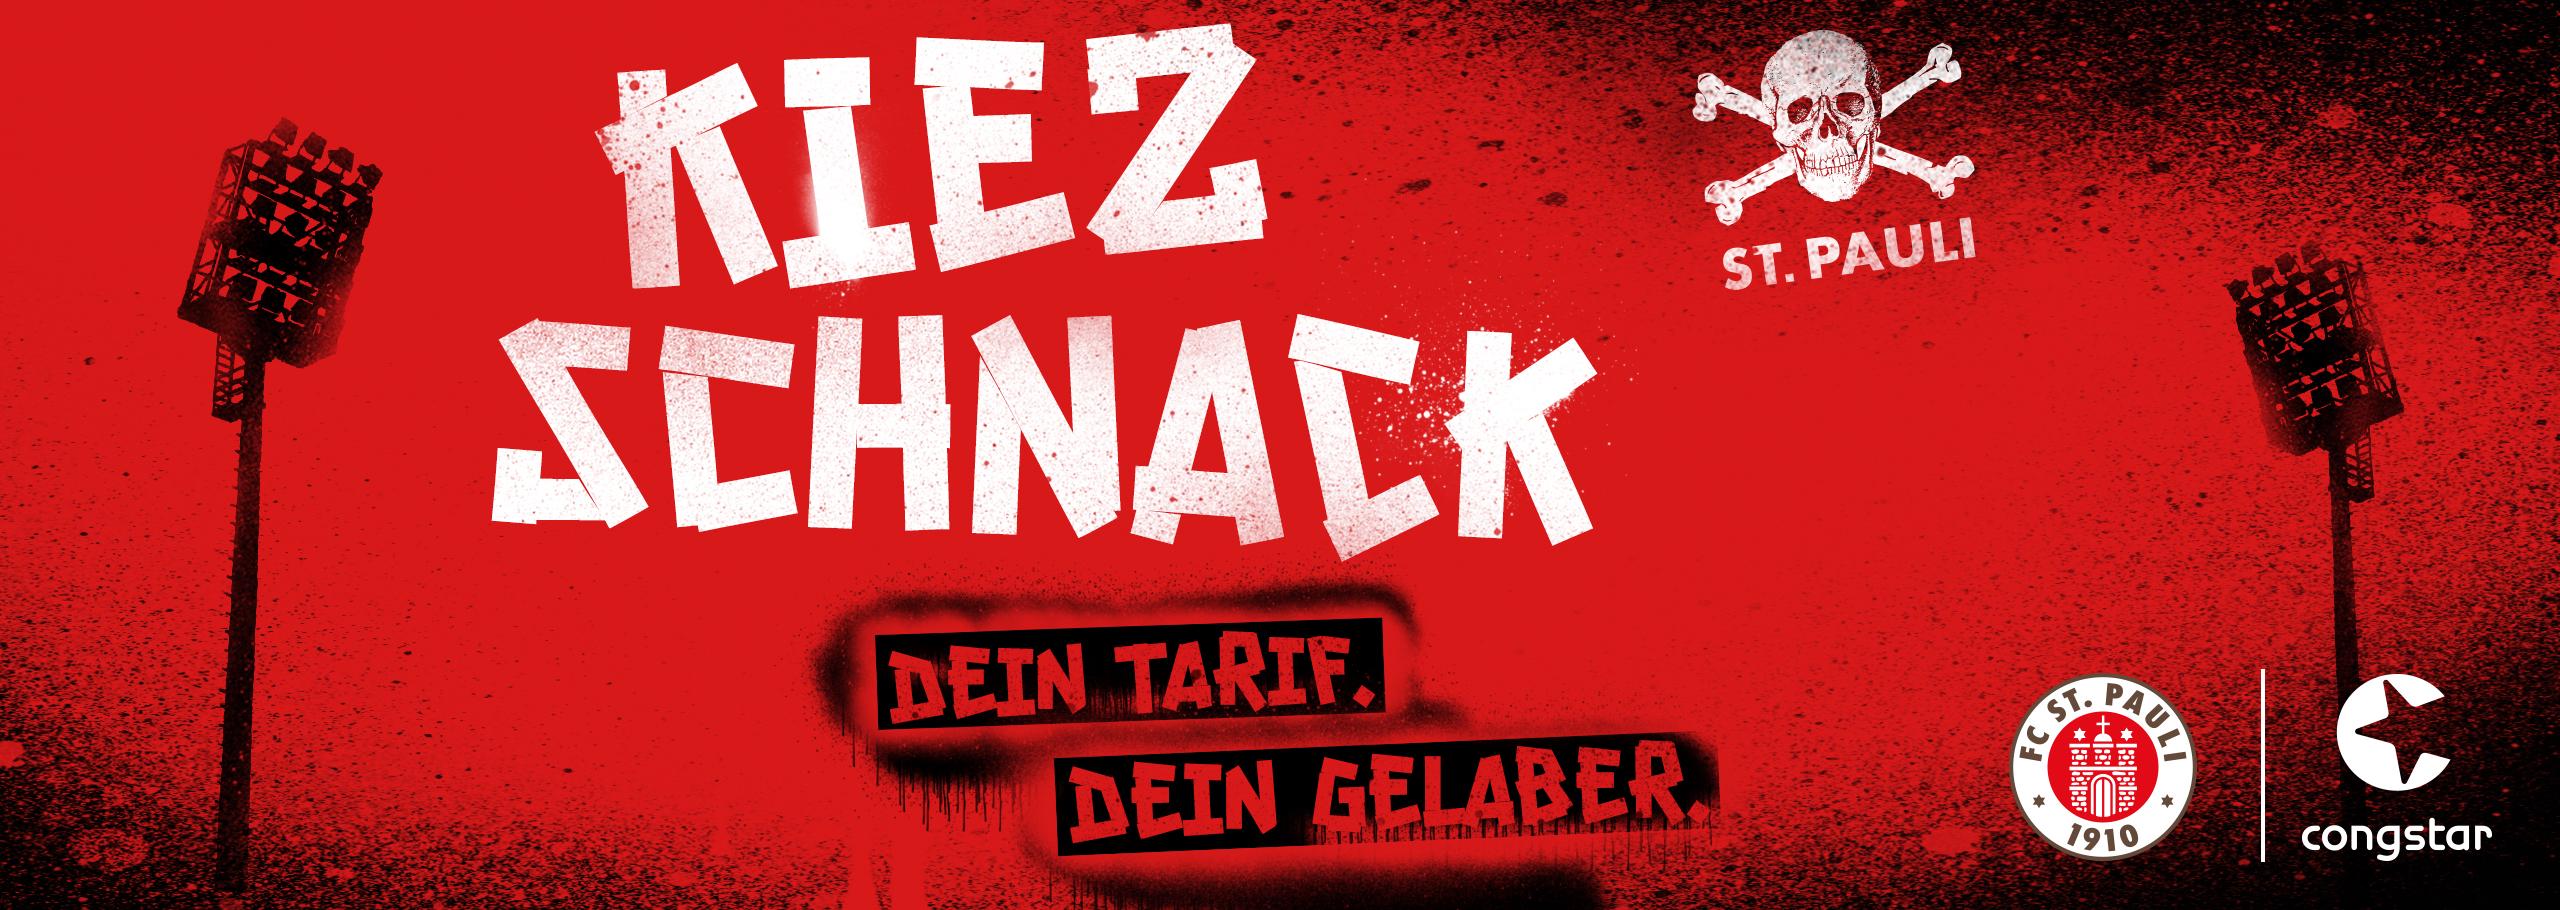 "Der FCSP-Prepaid-Tarif ""Kiez Schnack"""